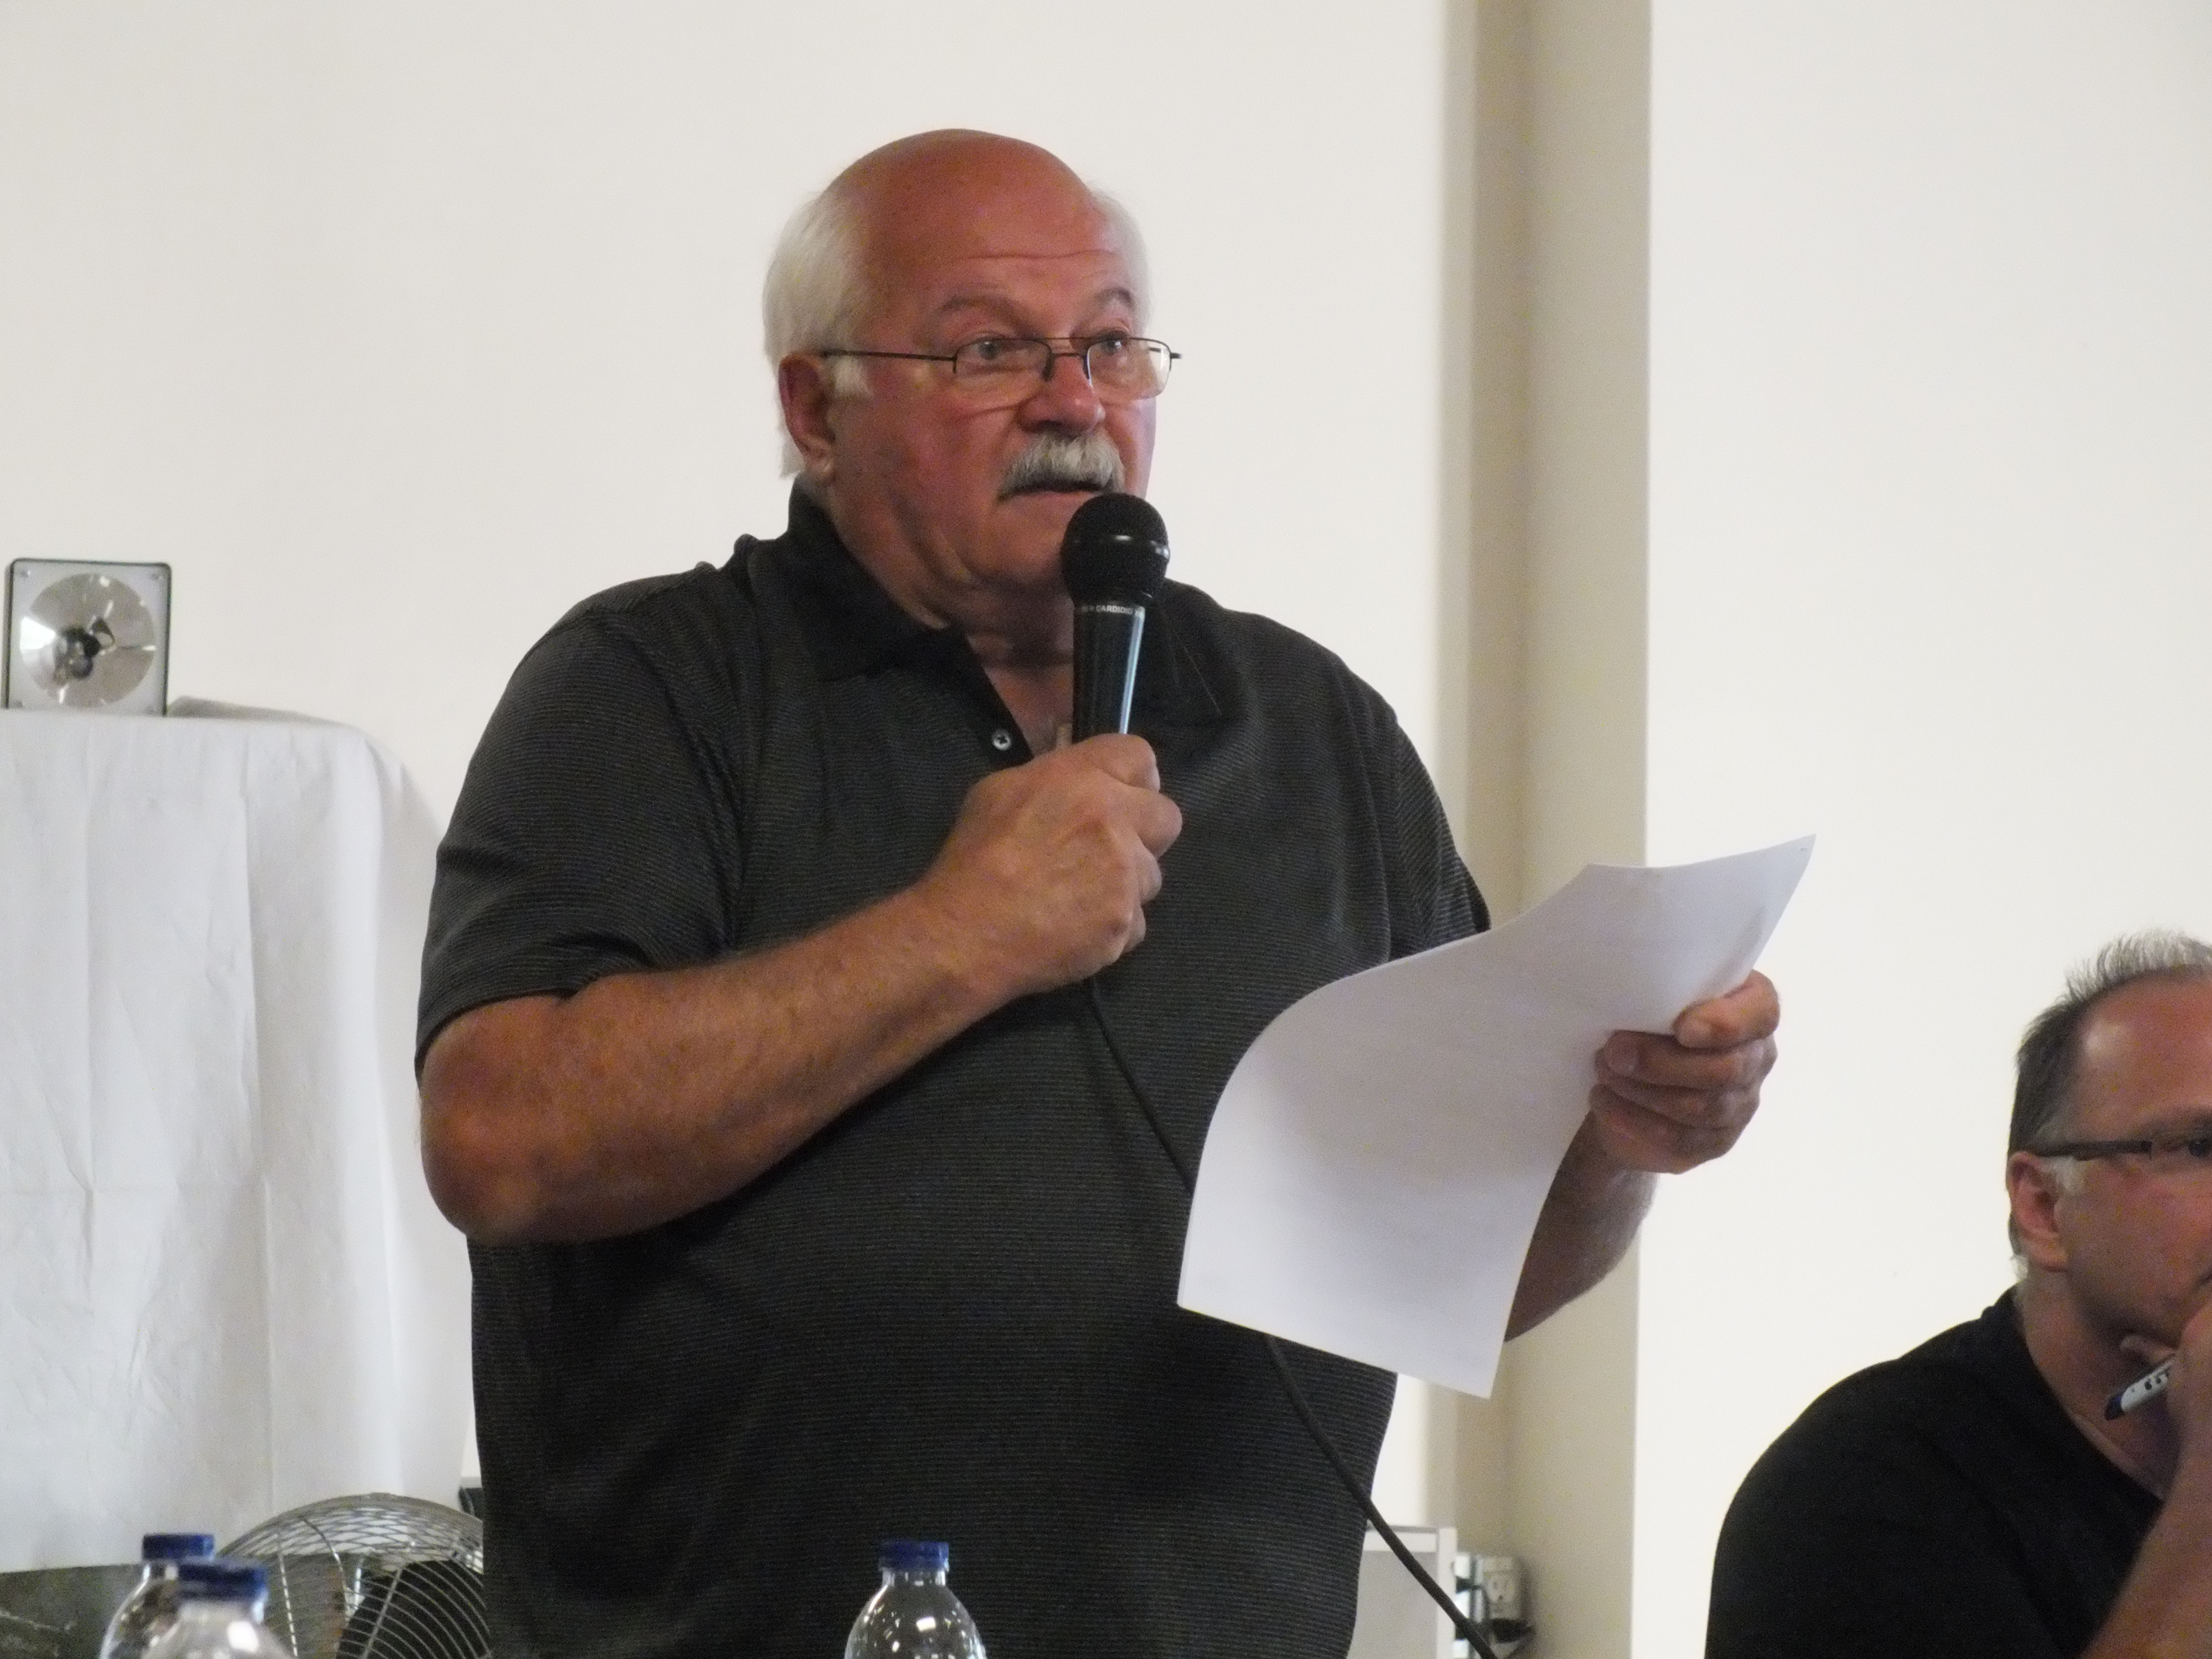 Raymond Carignan